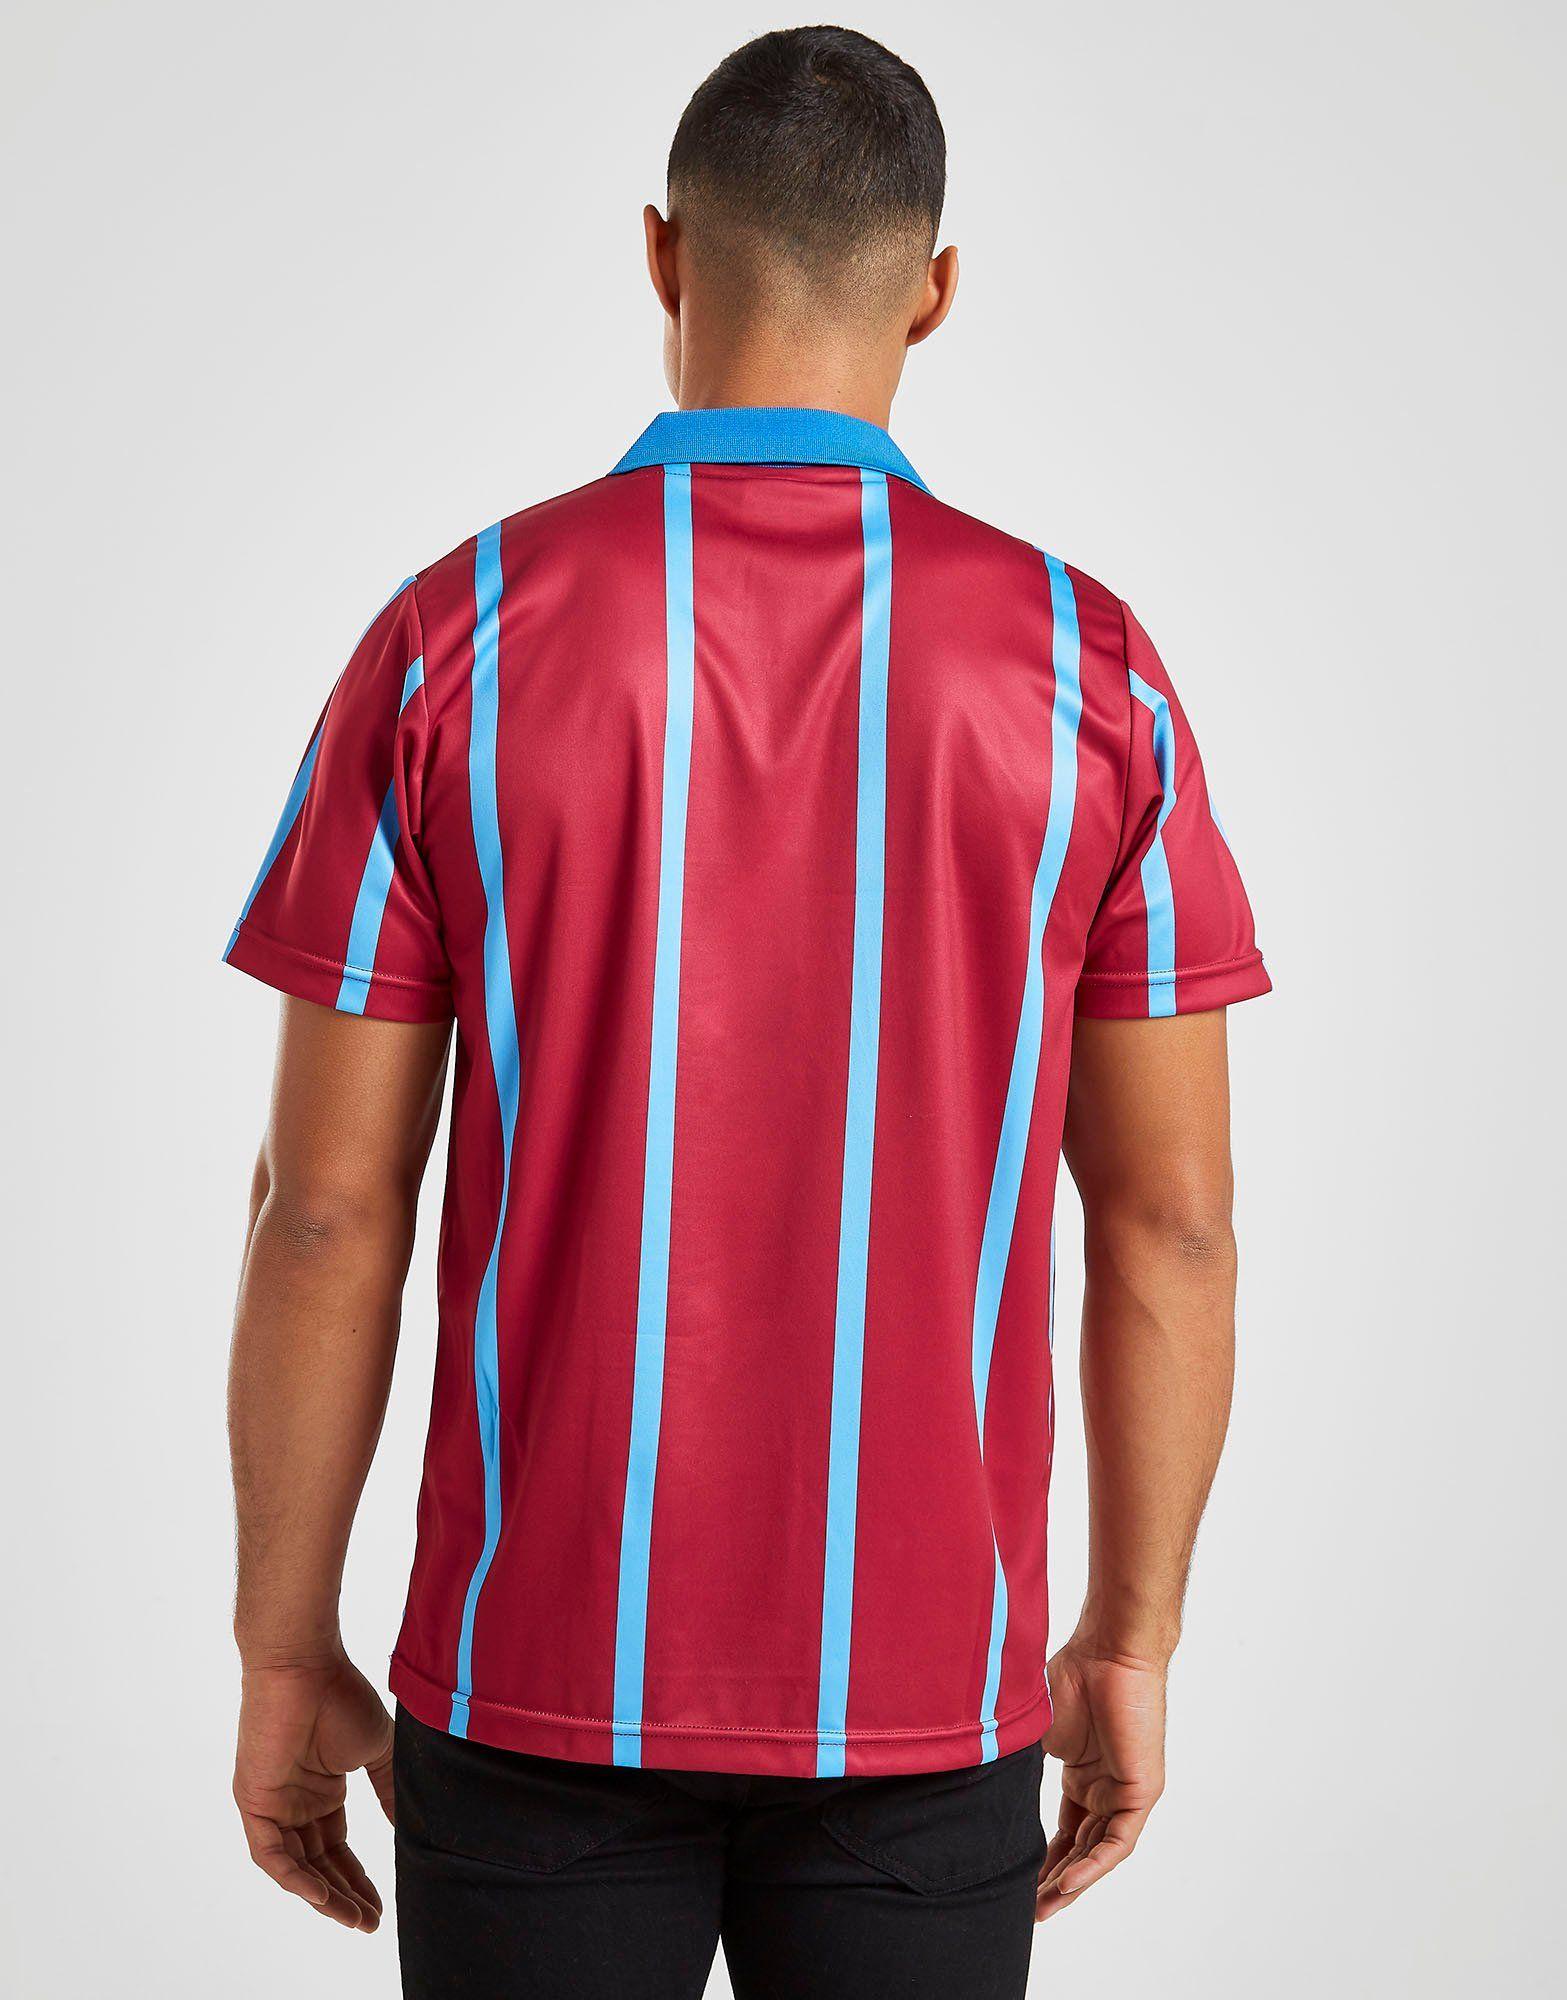 Score Draw Aston Villa FC '94 Home Shirt